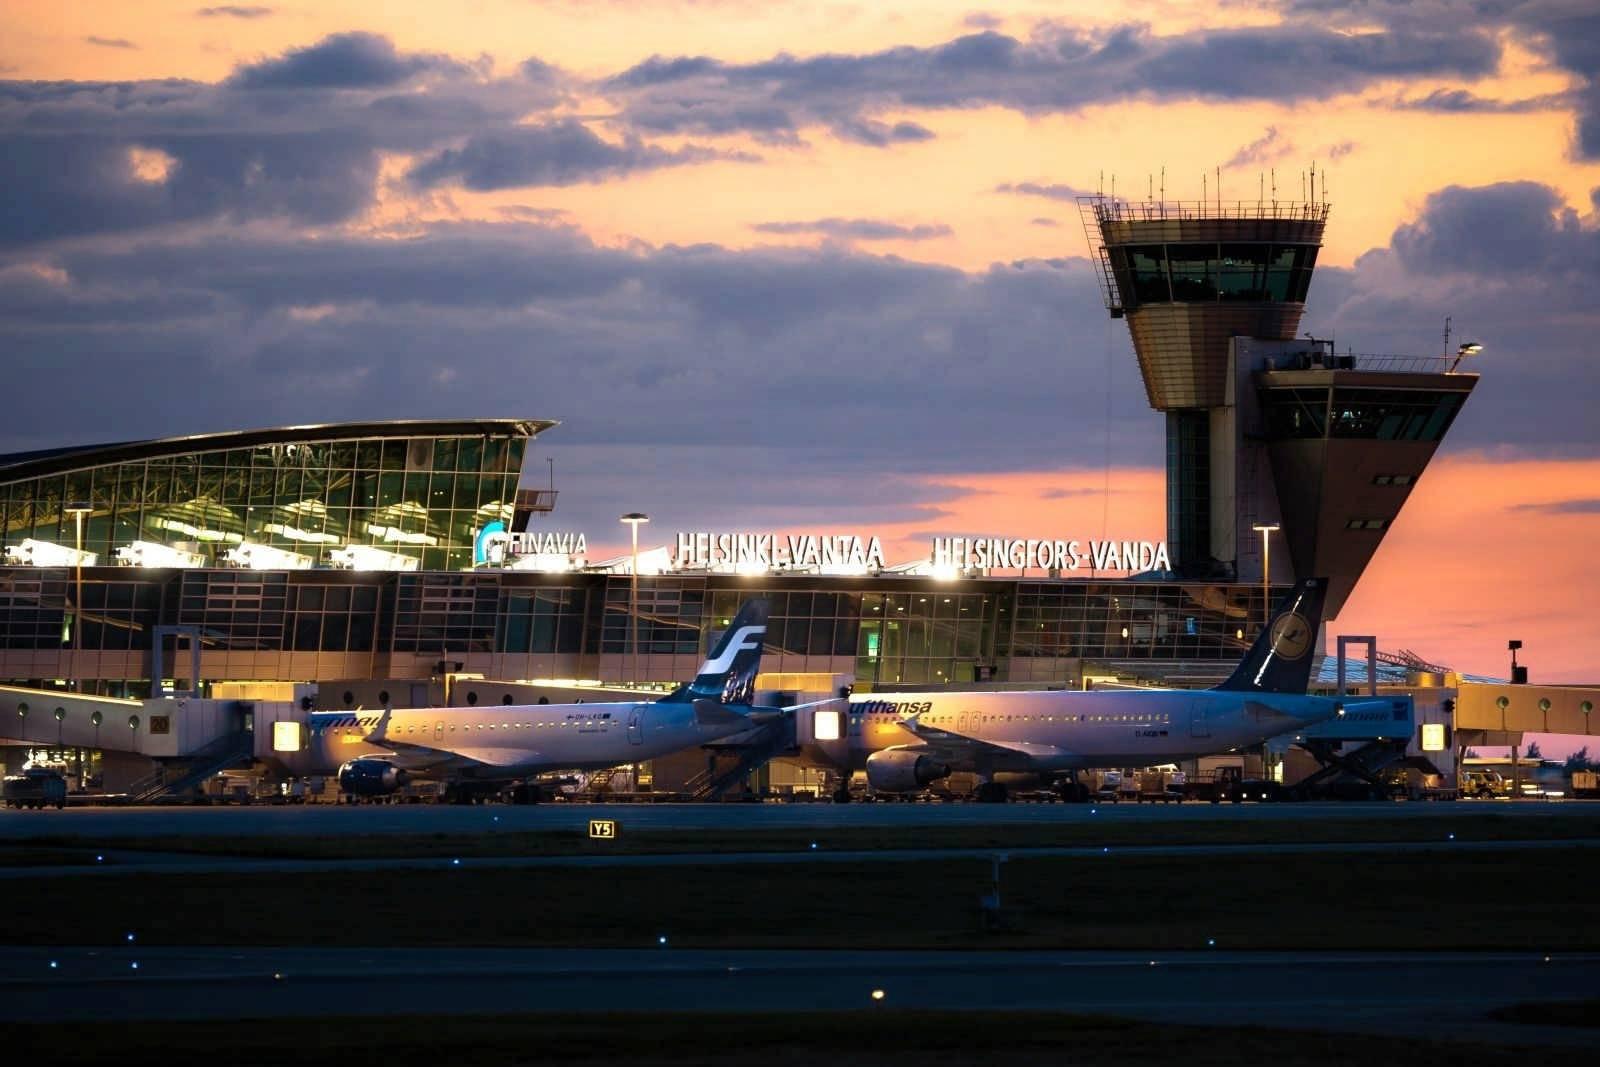 Аэропорт вантаа хельсинки — сайт на русском языке